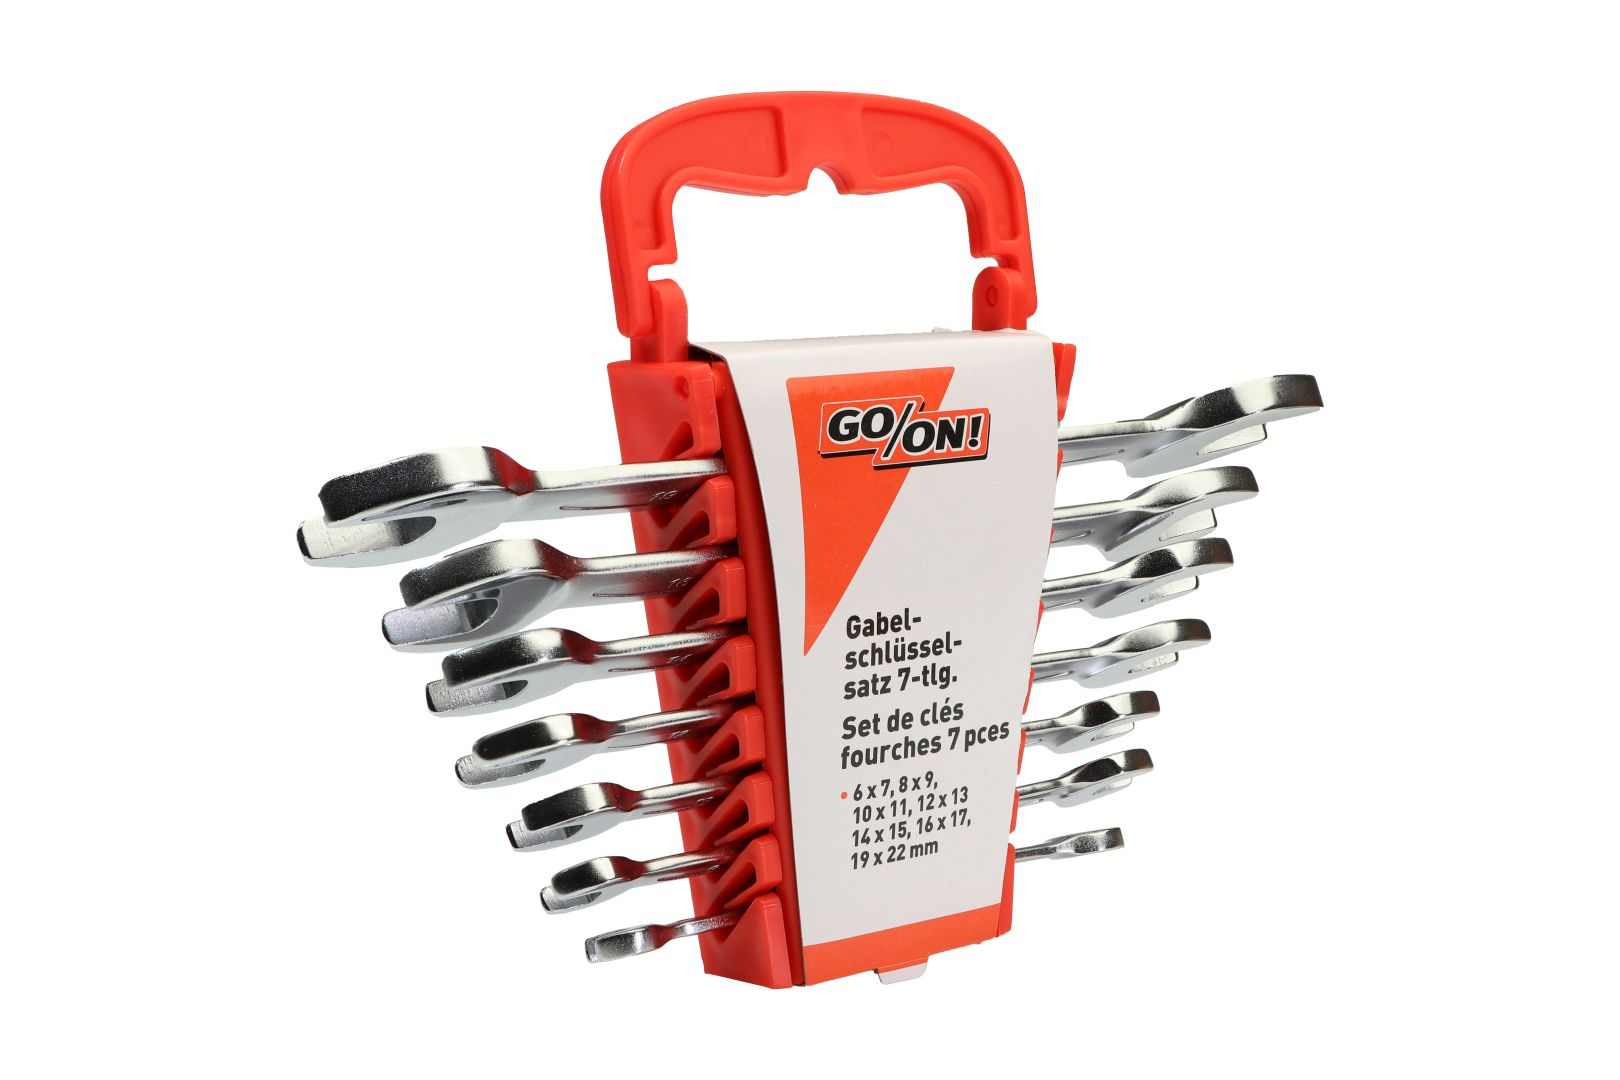 GO/ON Gabelschlüsselsatz, Schlüsselgrößen 6 - 22 mm, 7-teilig